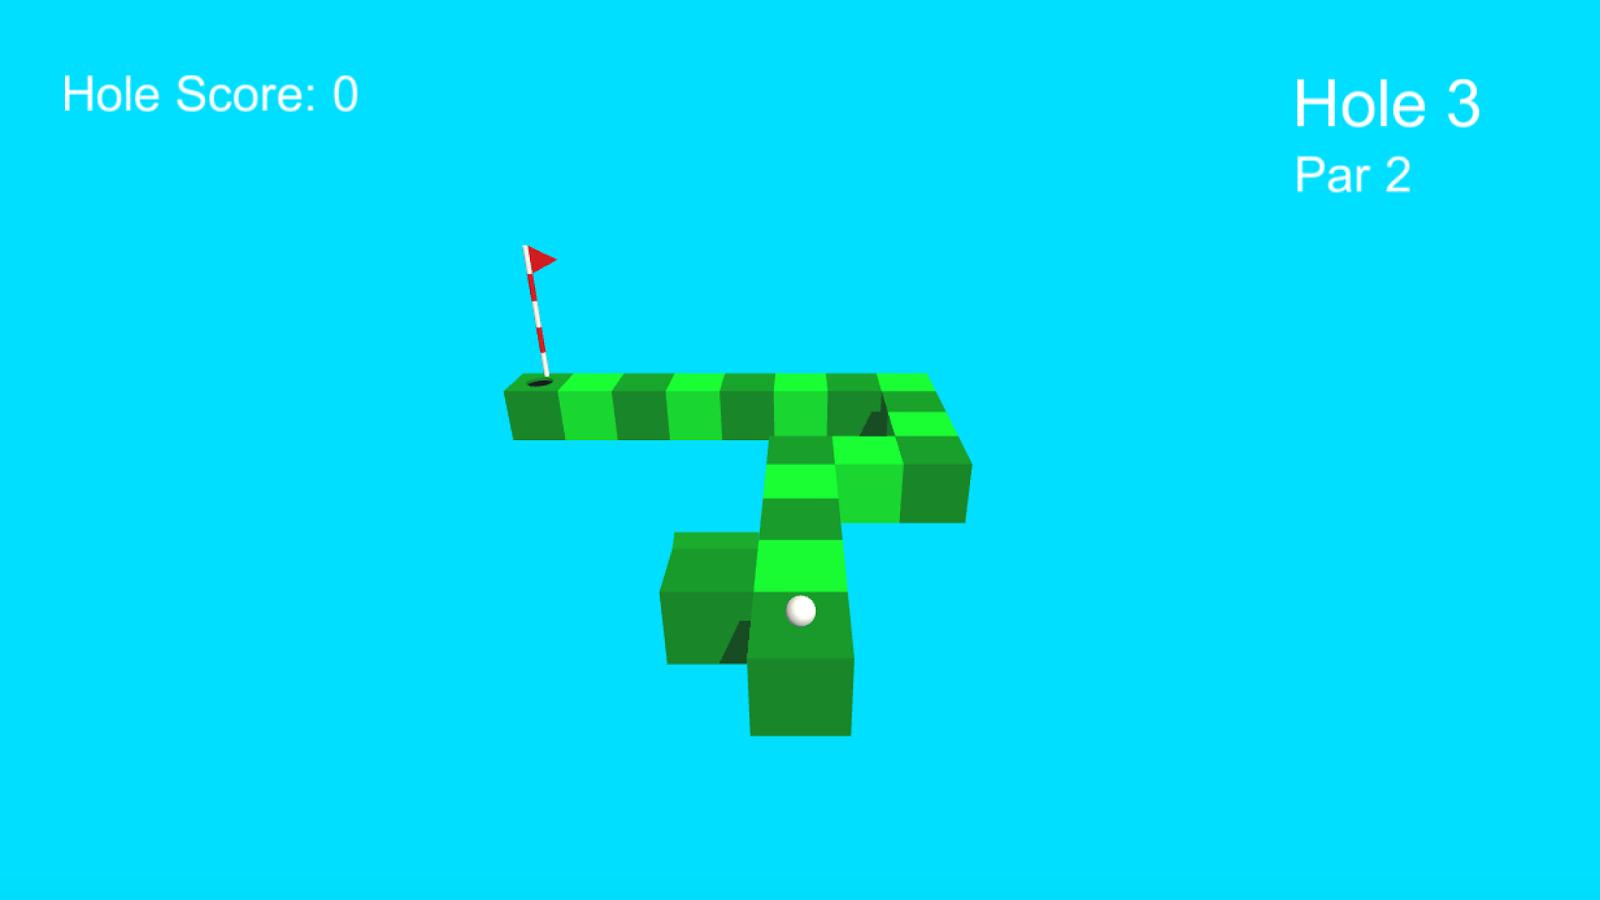 TipTap-Golf 16